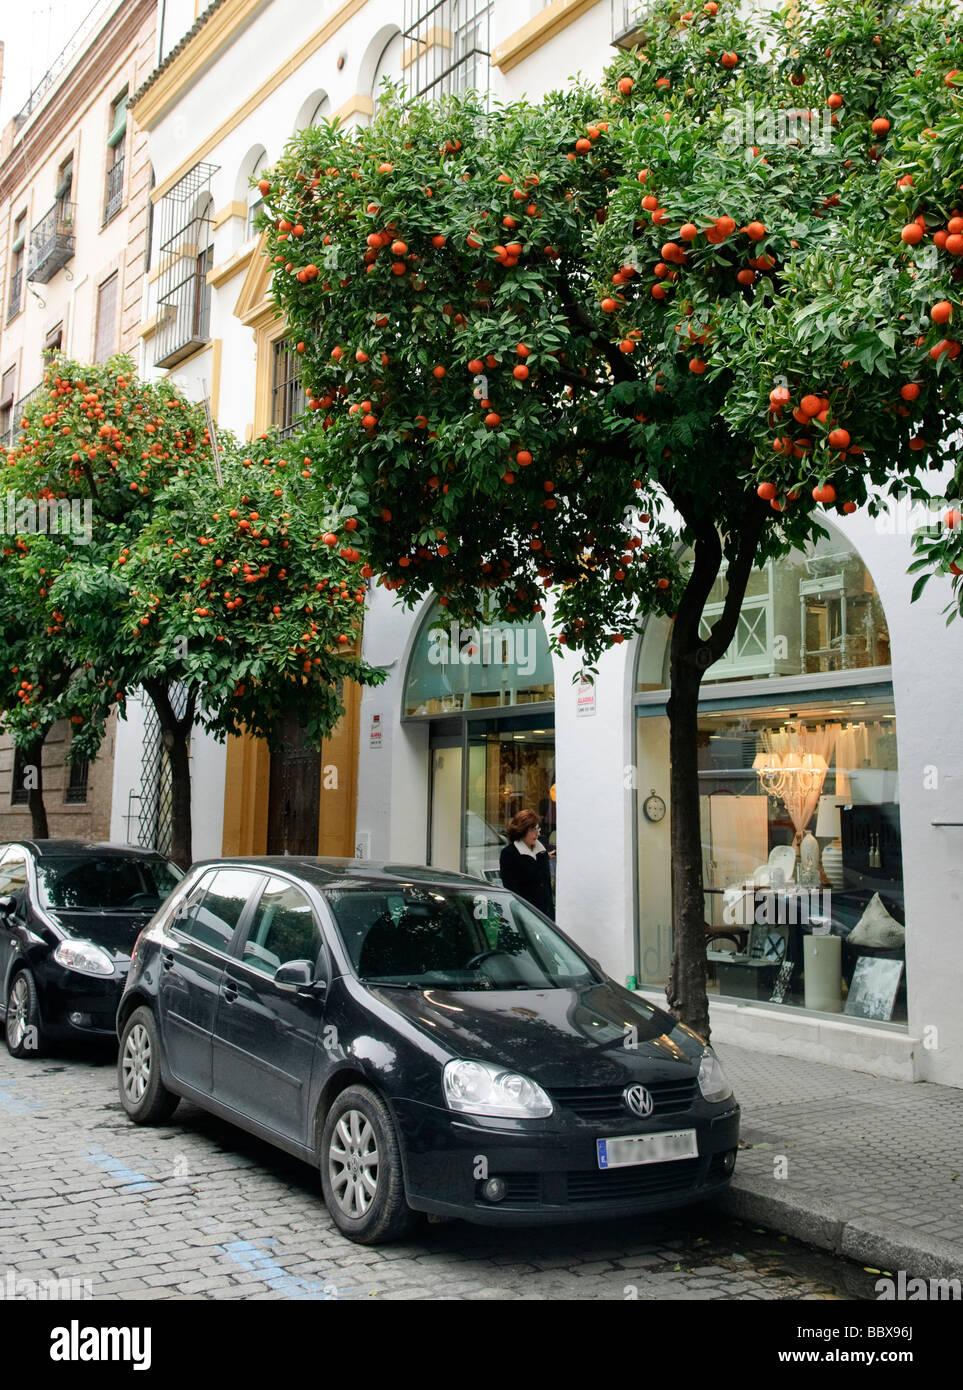 Innenstadt Einkaufsstraße gesäumt von Mandarinen Bäume in Sevilla, Spanien Stockbild